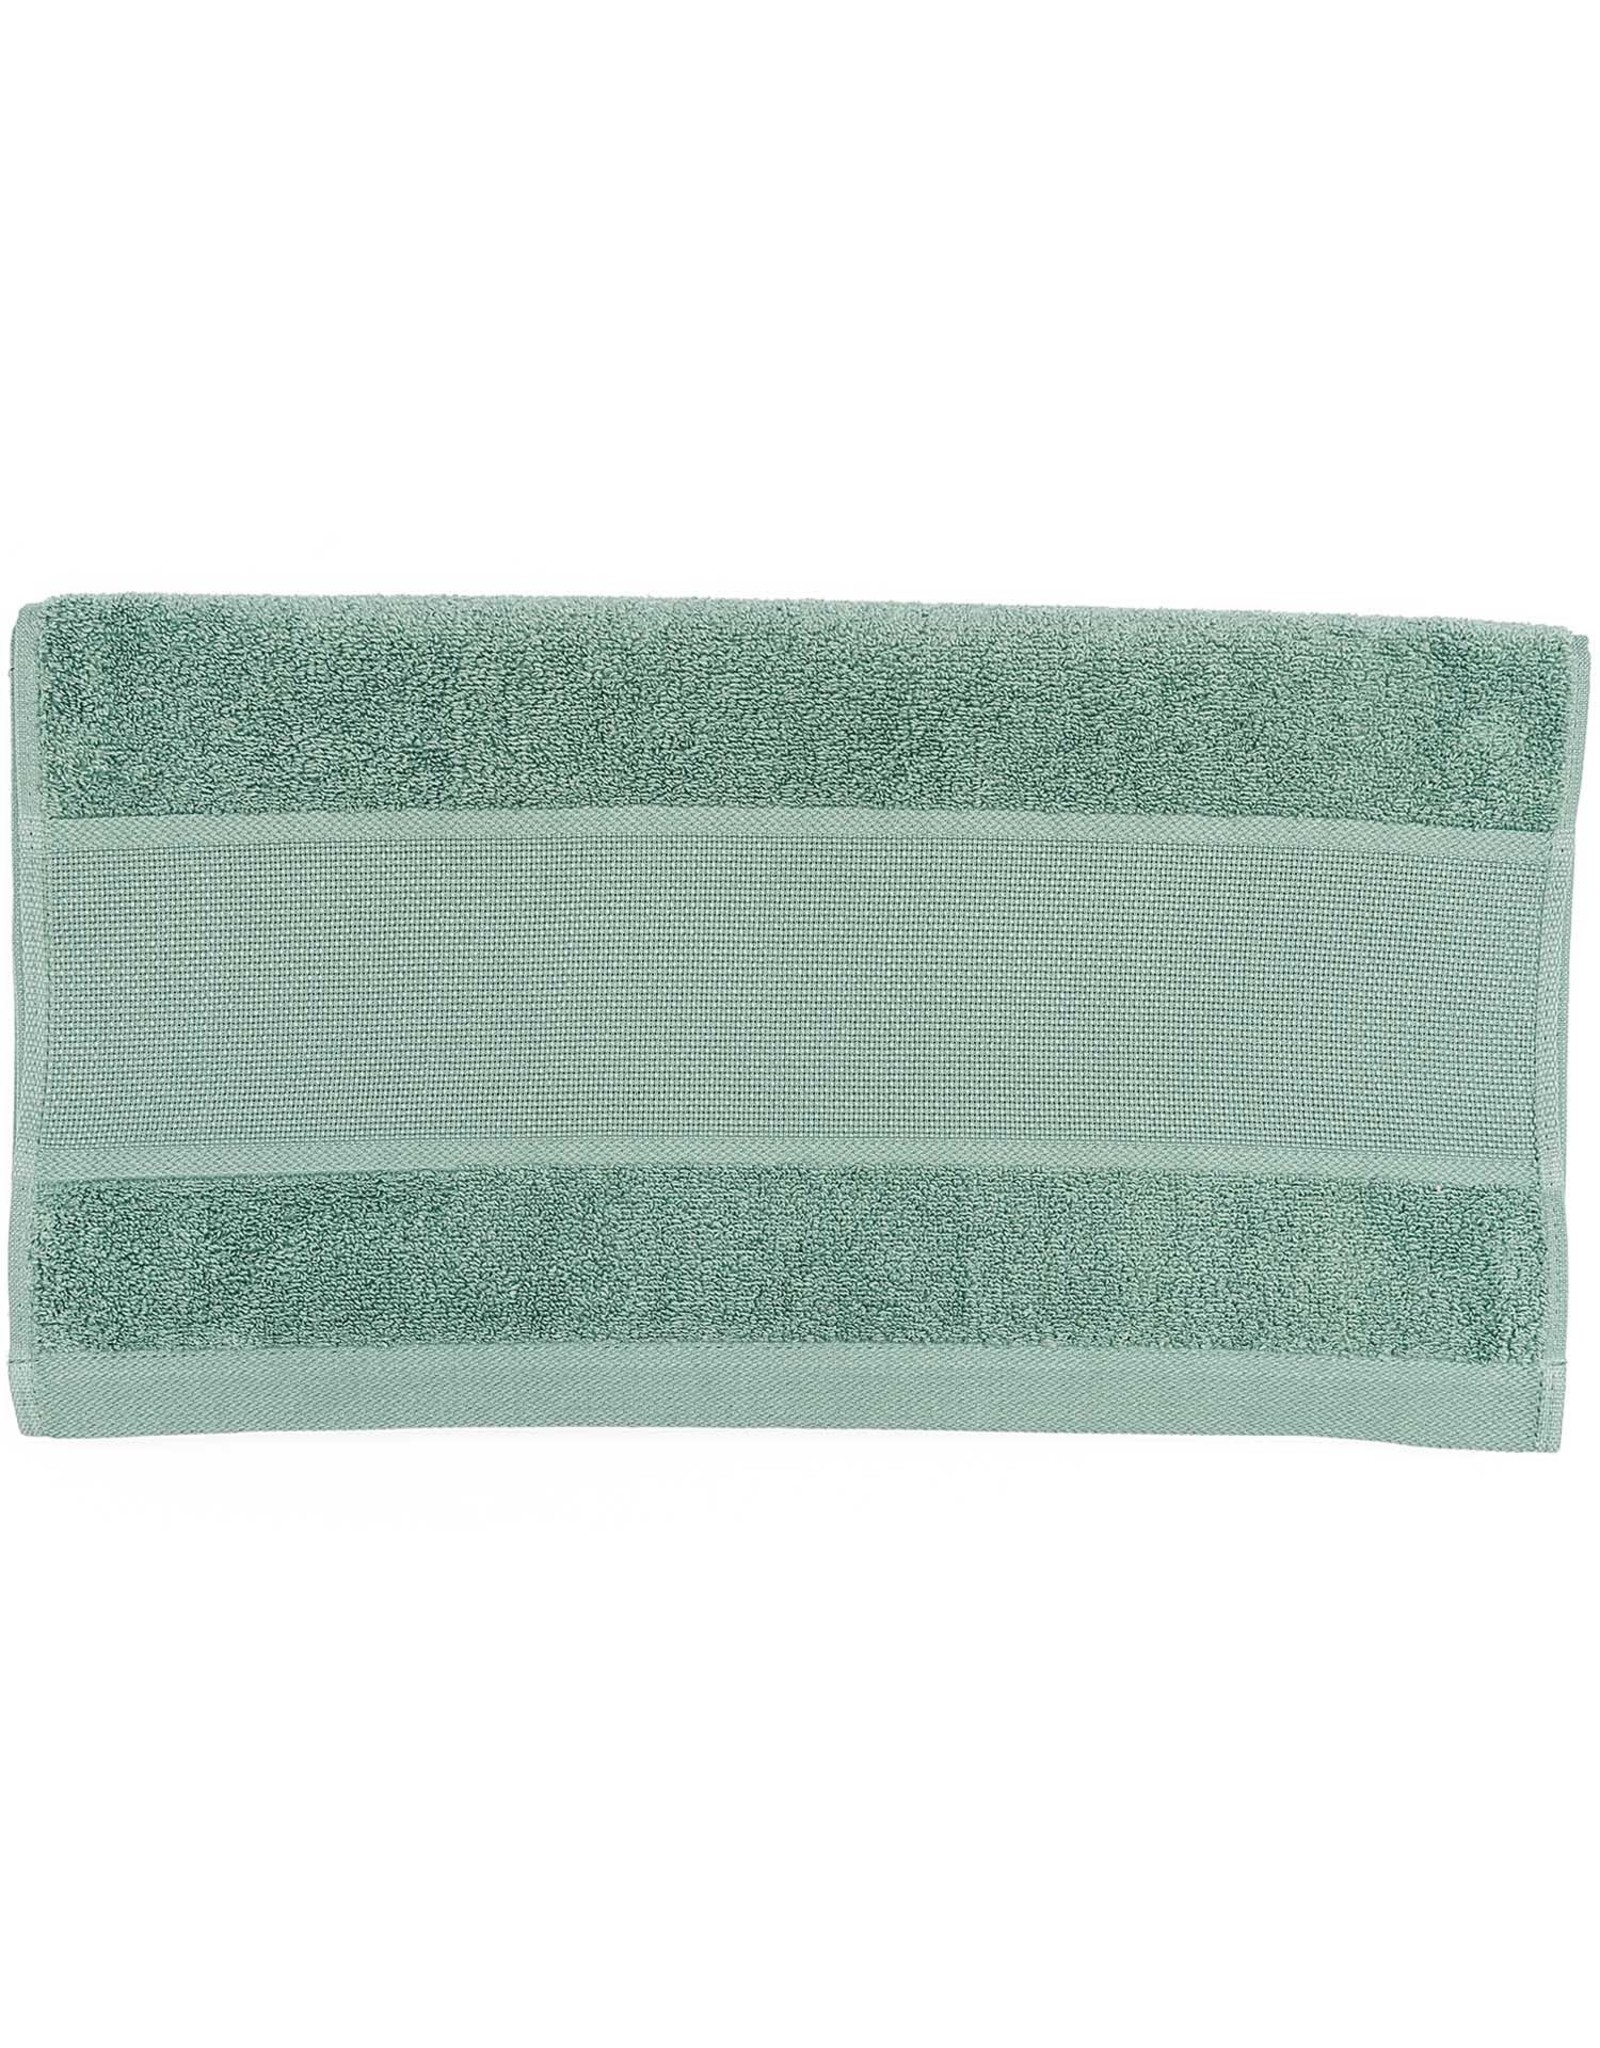 Rico Design Handdoek groen aida 50/100 cm